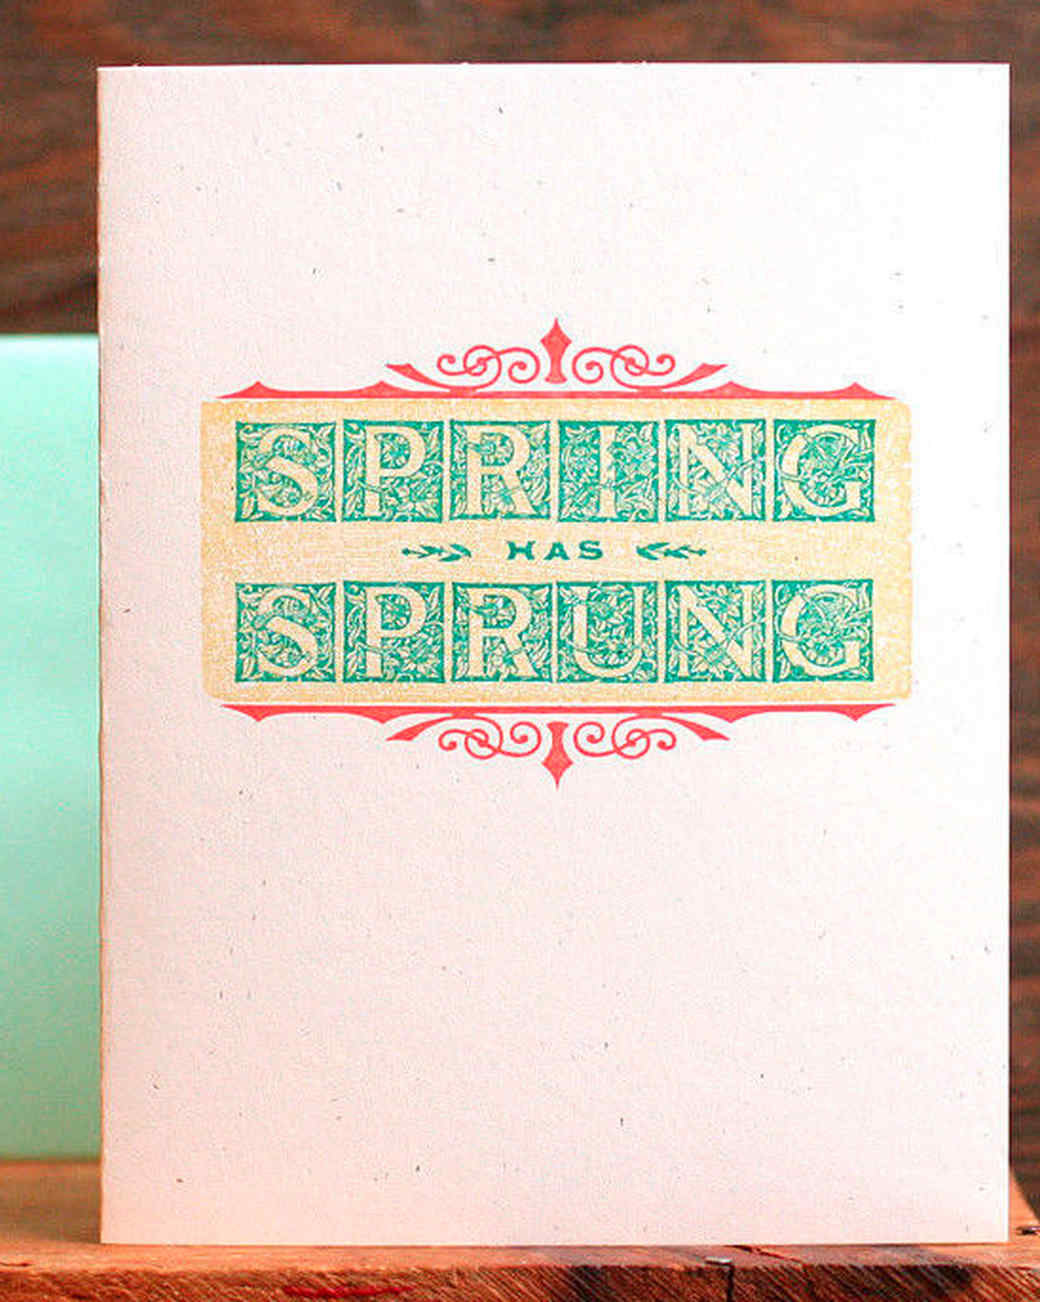 starshaped-press-spring-card-am-032014.jpg